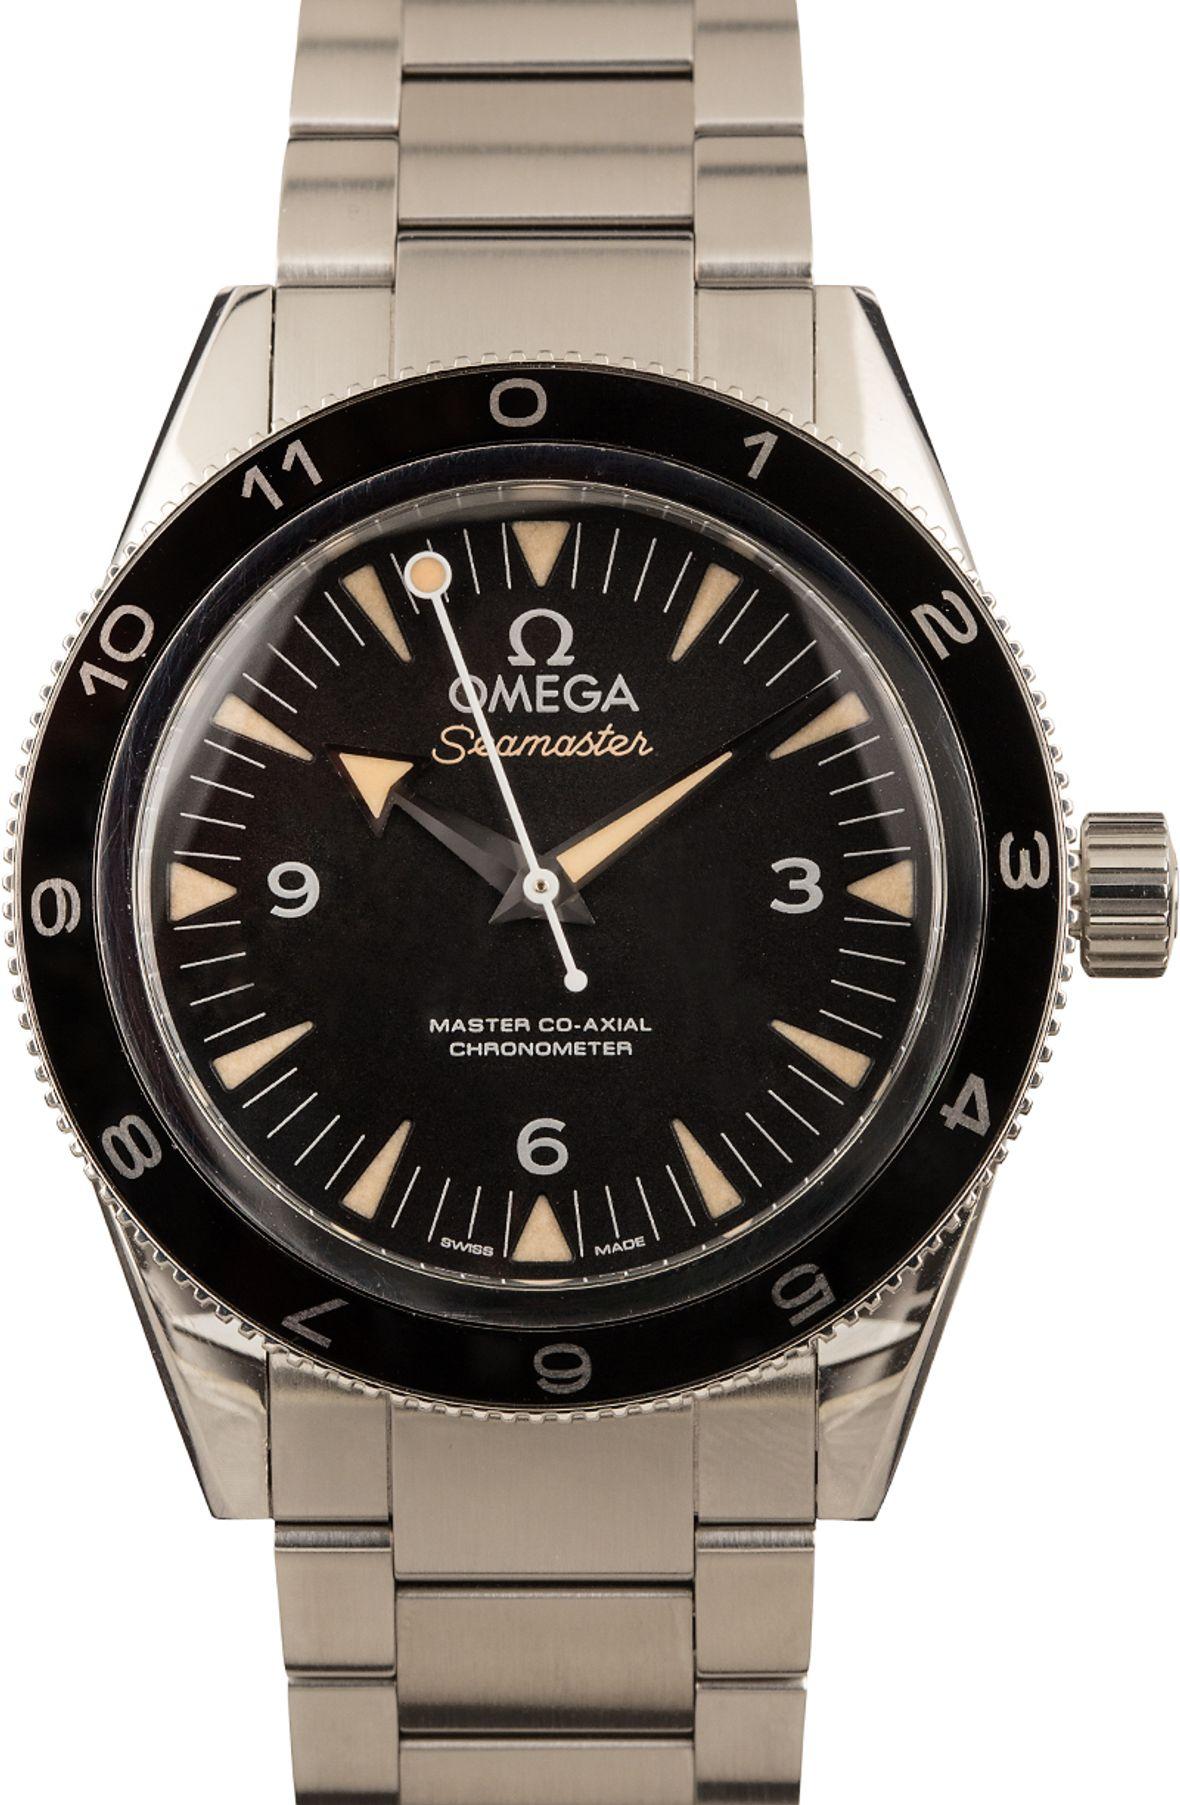 James Bond 007 Omega Seamaster 300 SPECTRE Limited Edition